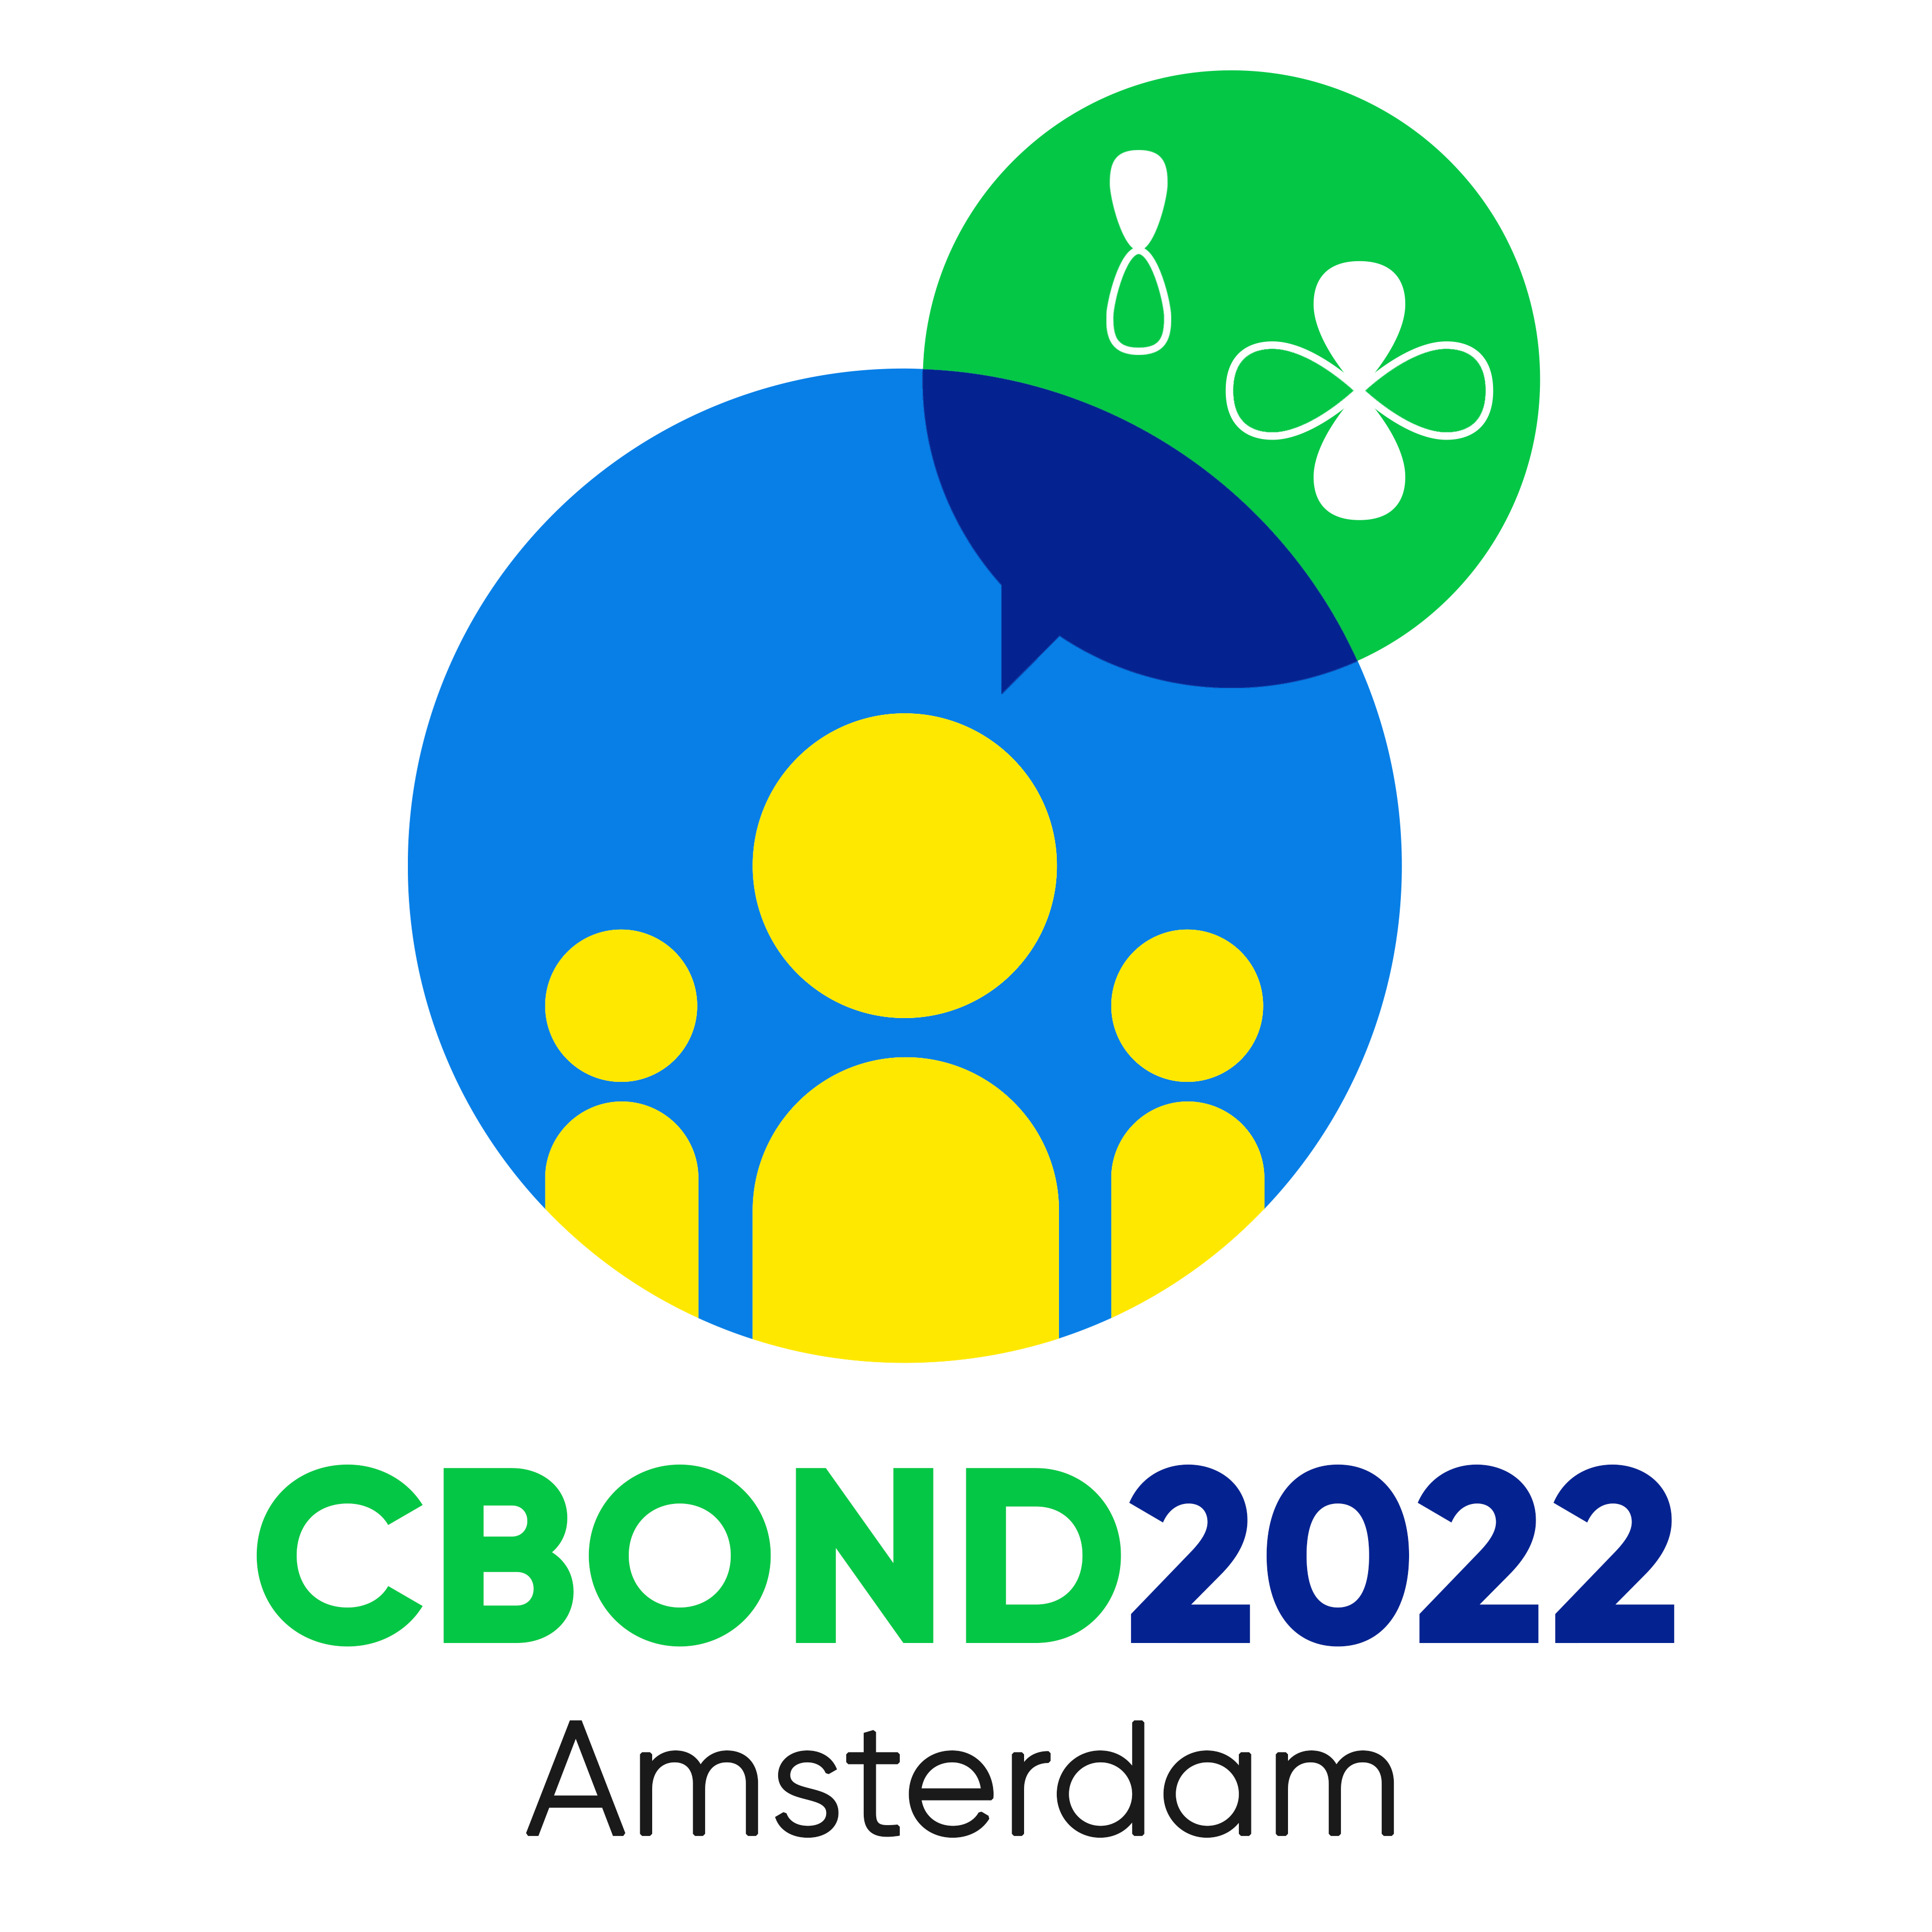 CBOND2022_logo.png